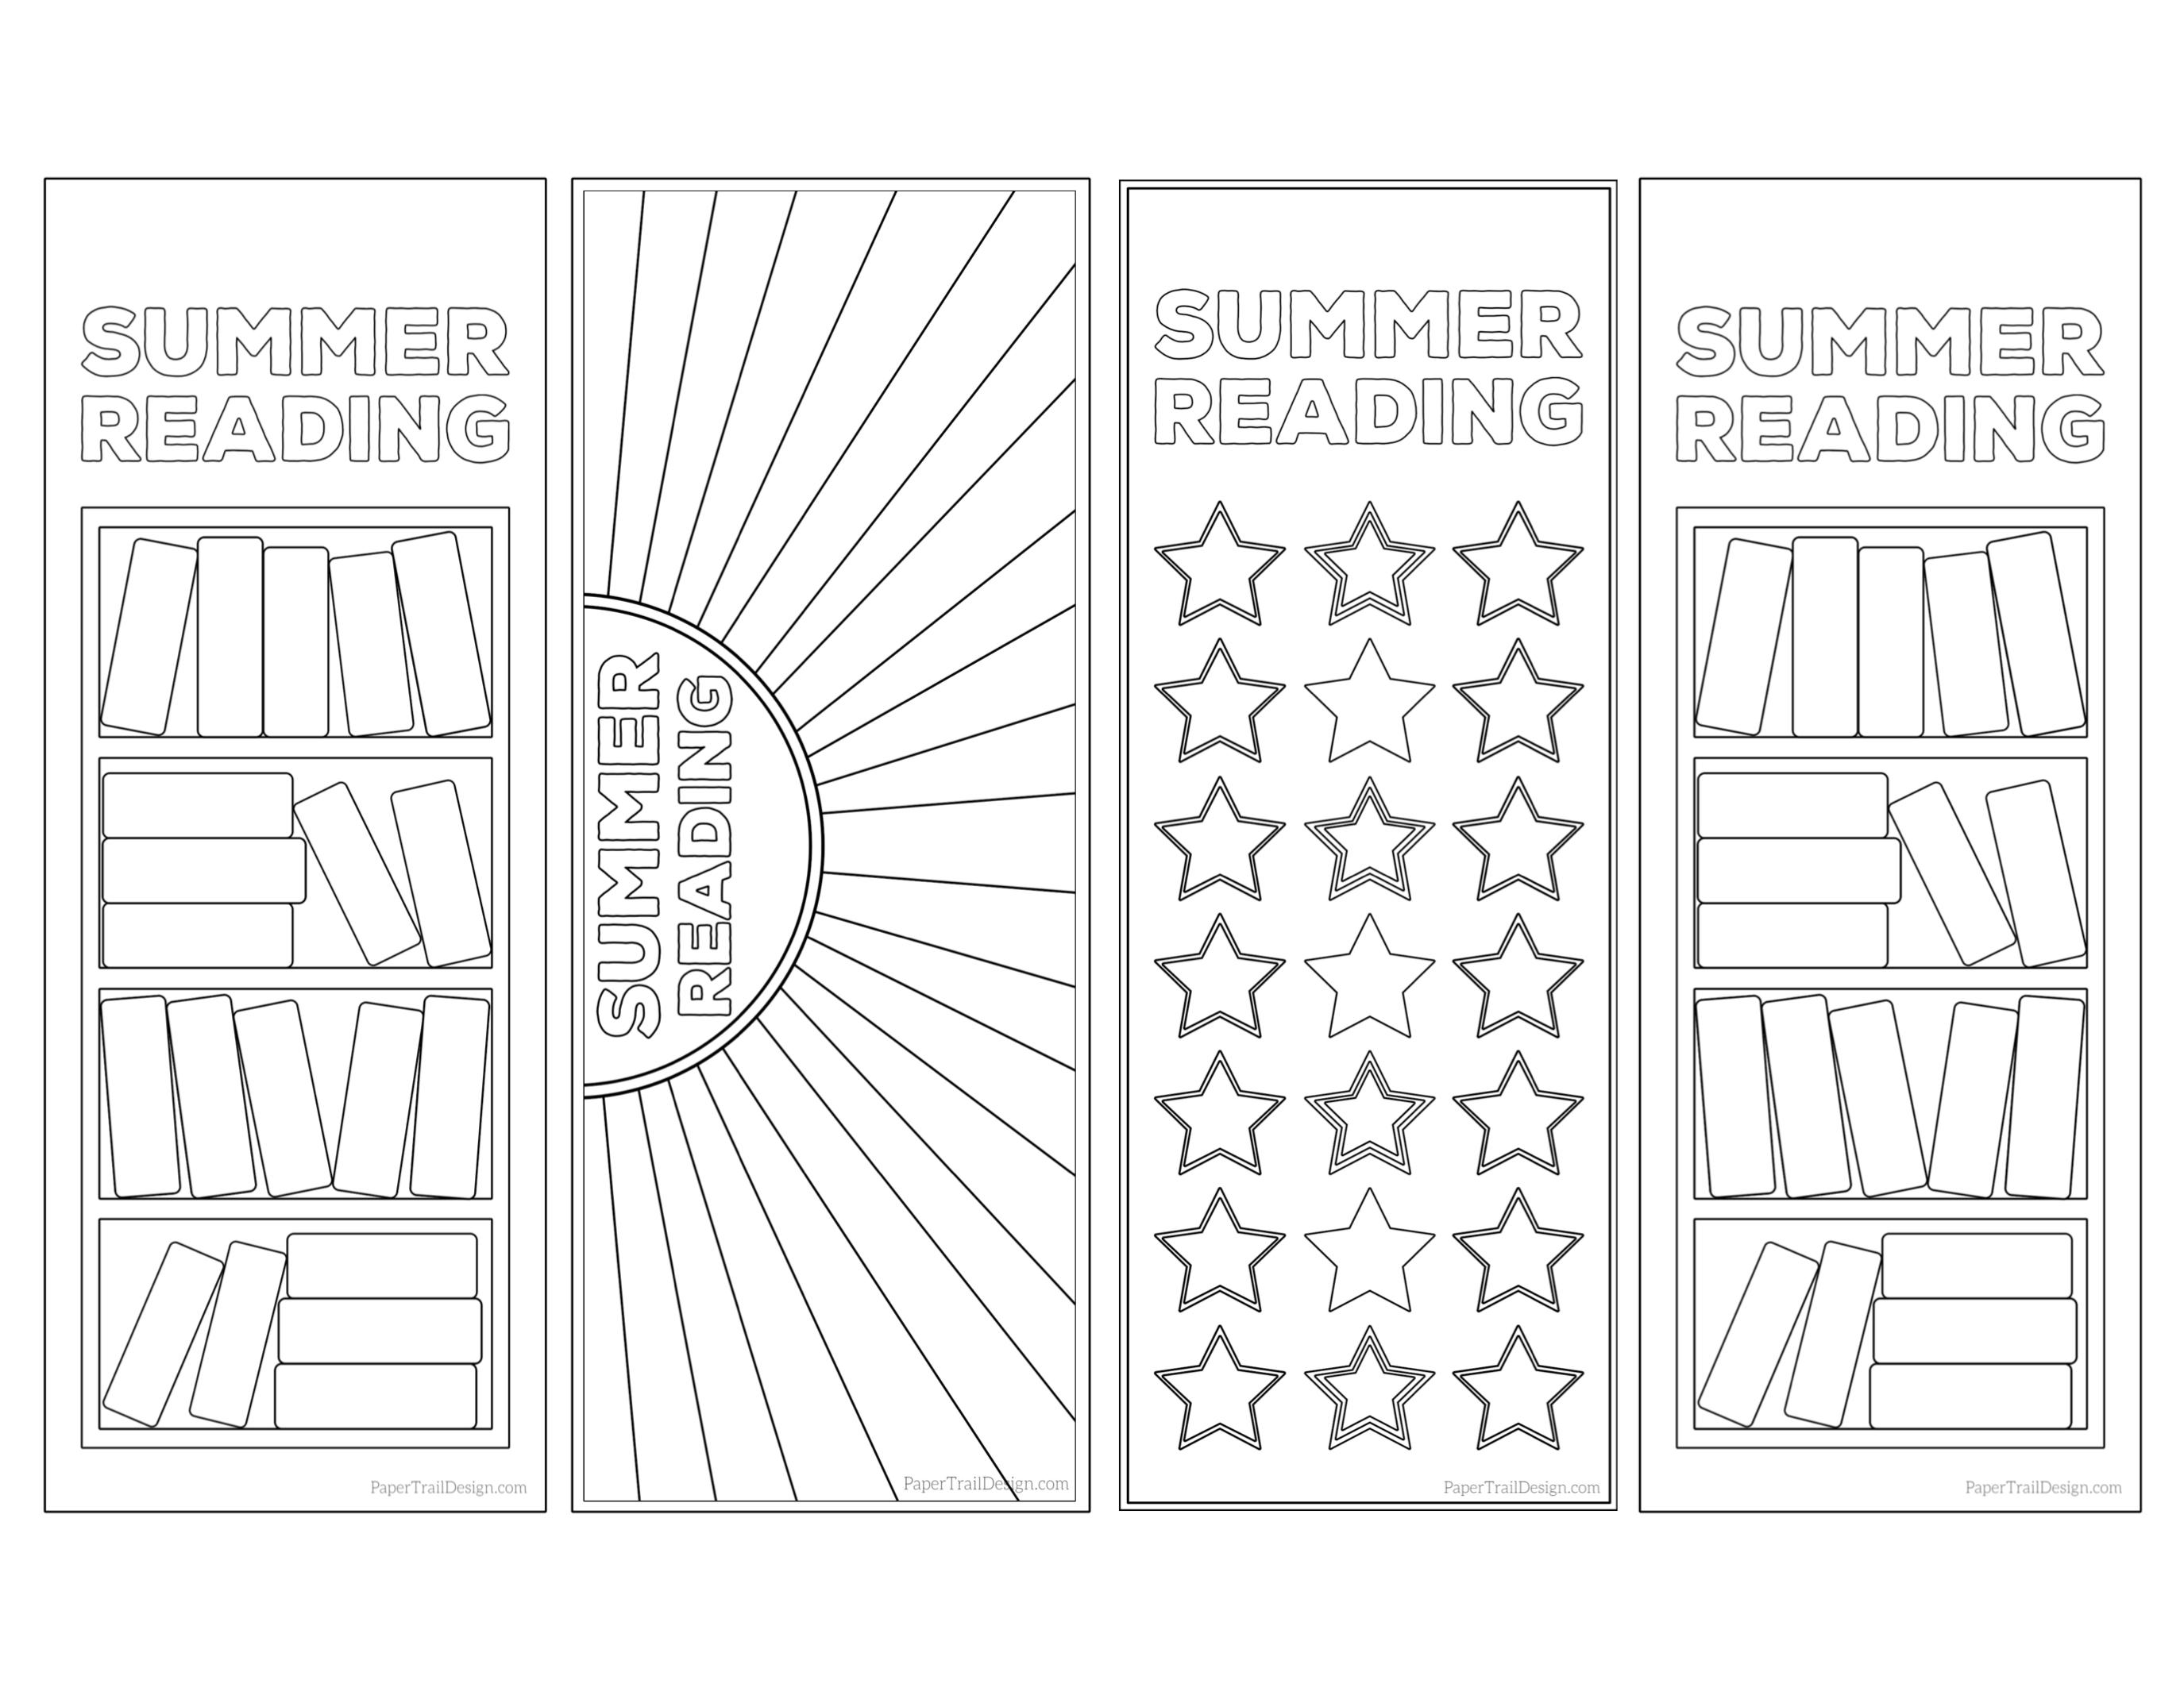 summer reading log bookmark printable tracker - paper trail design